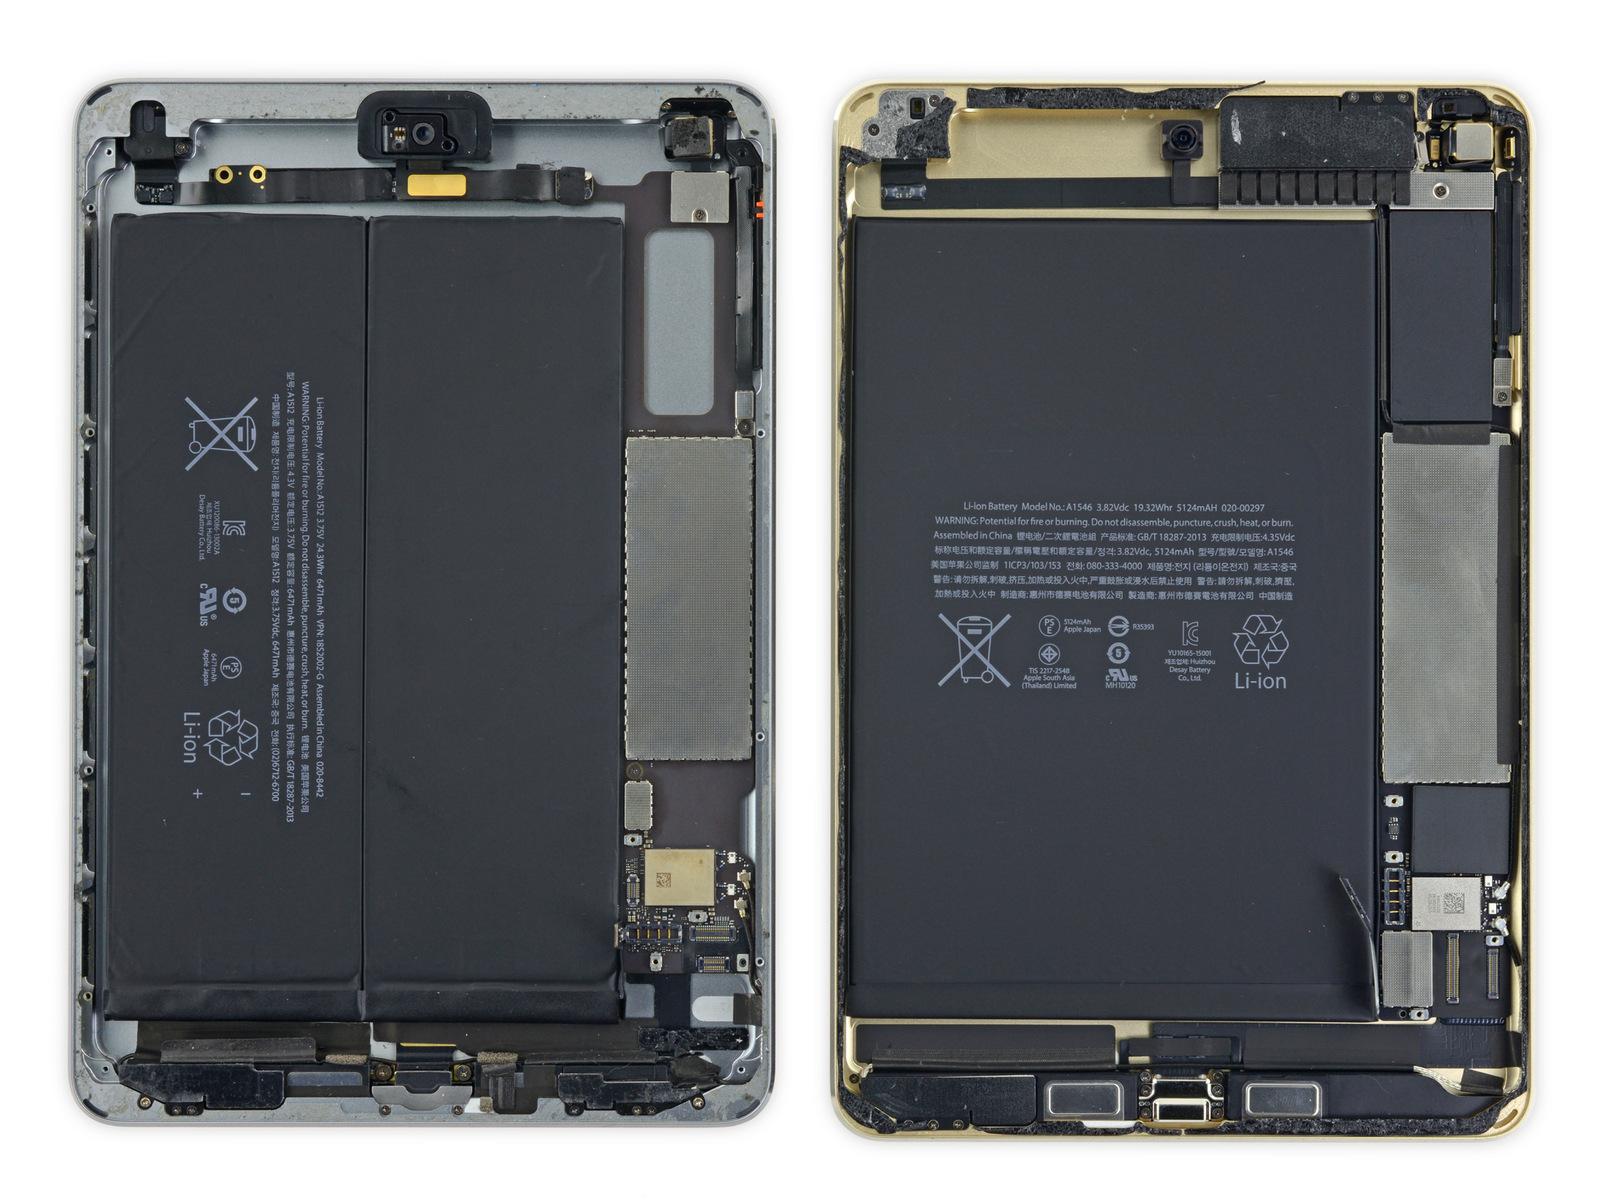 iPad mini 3 vs iPad mini 4